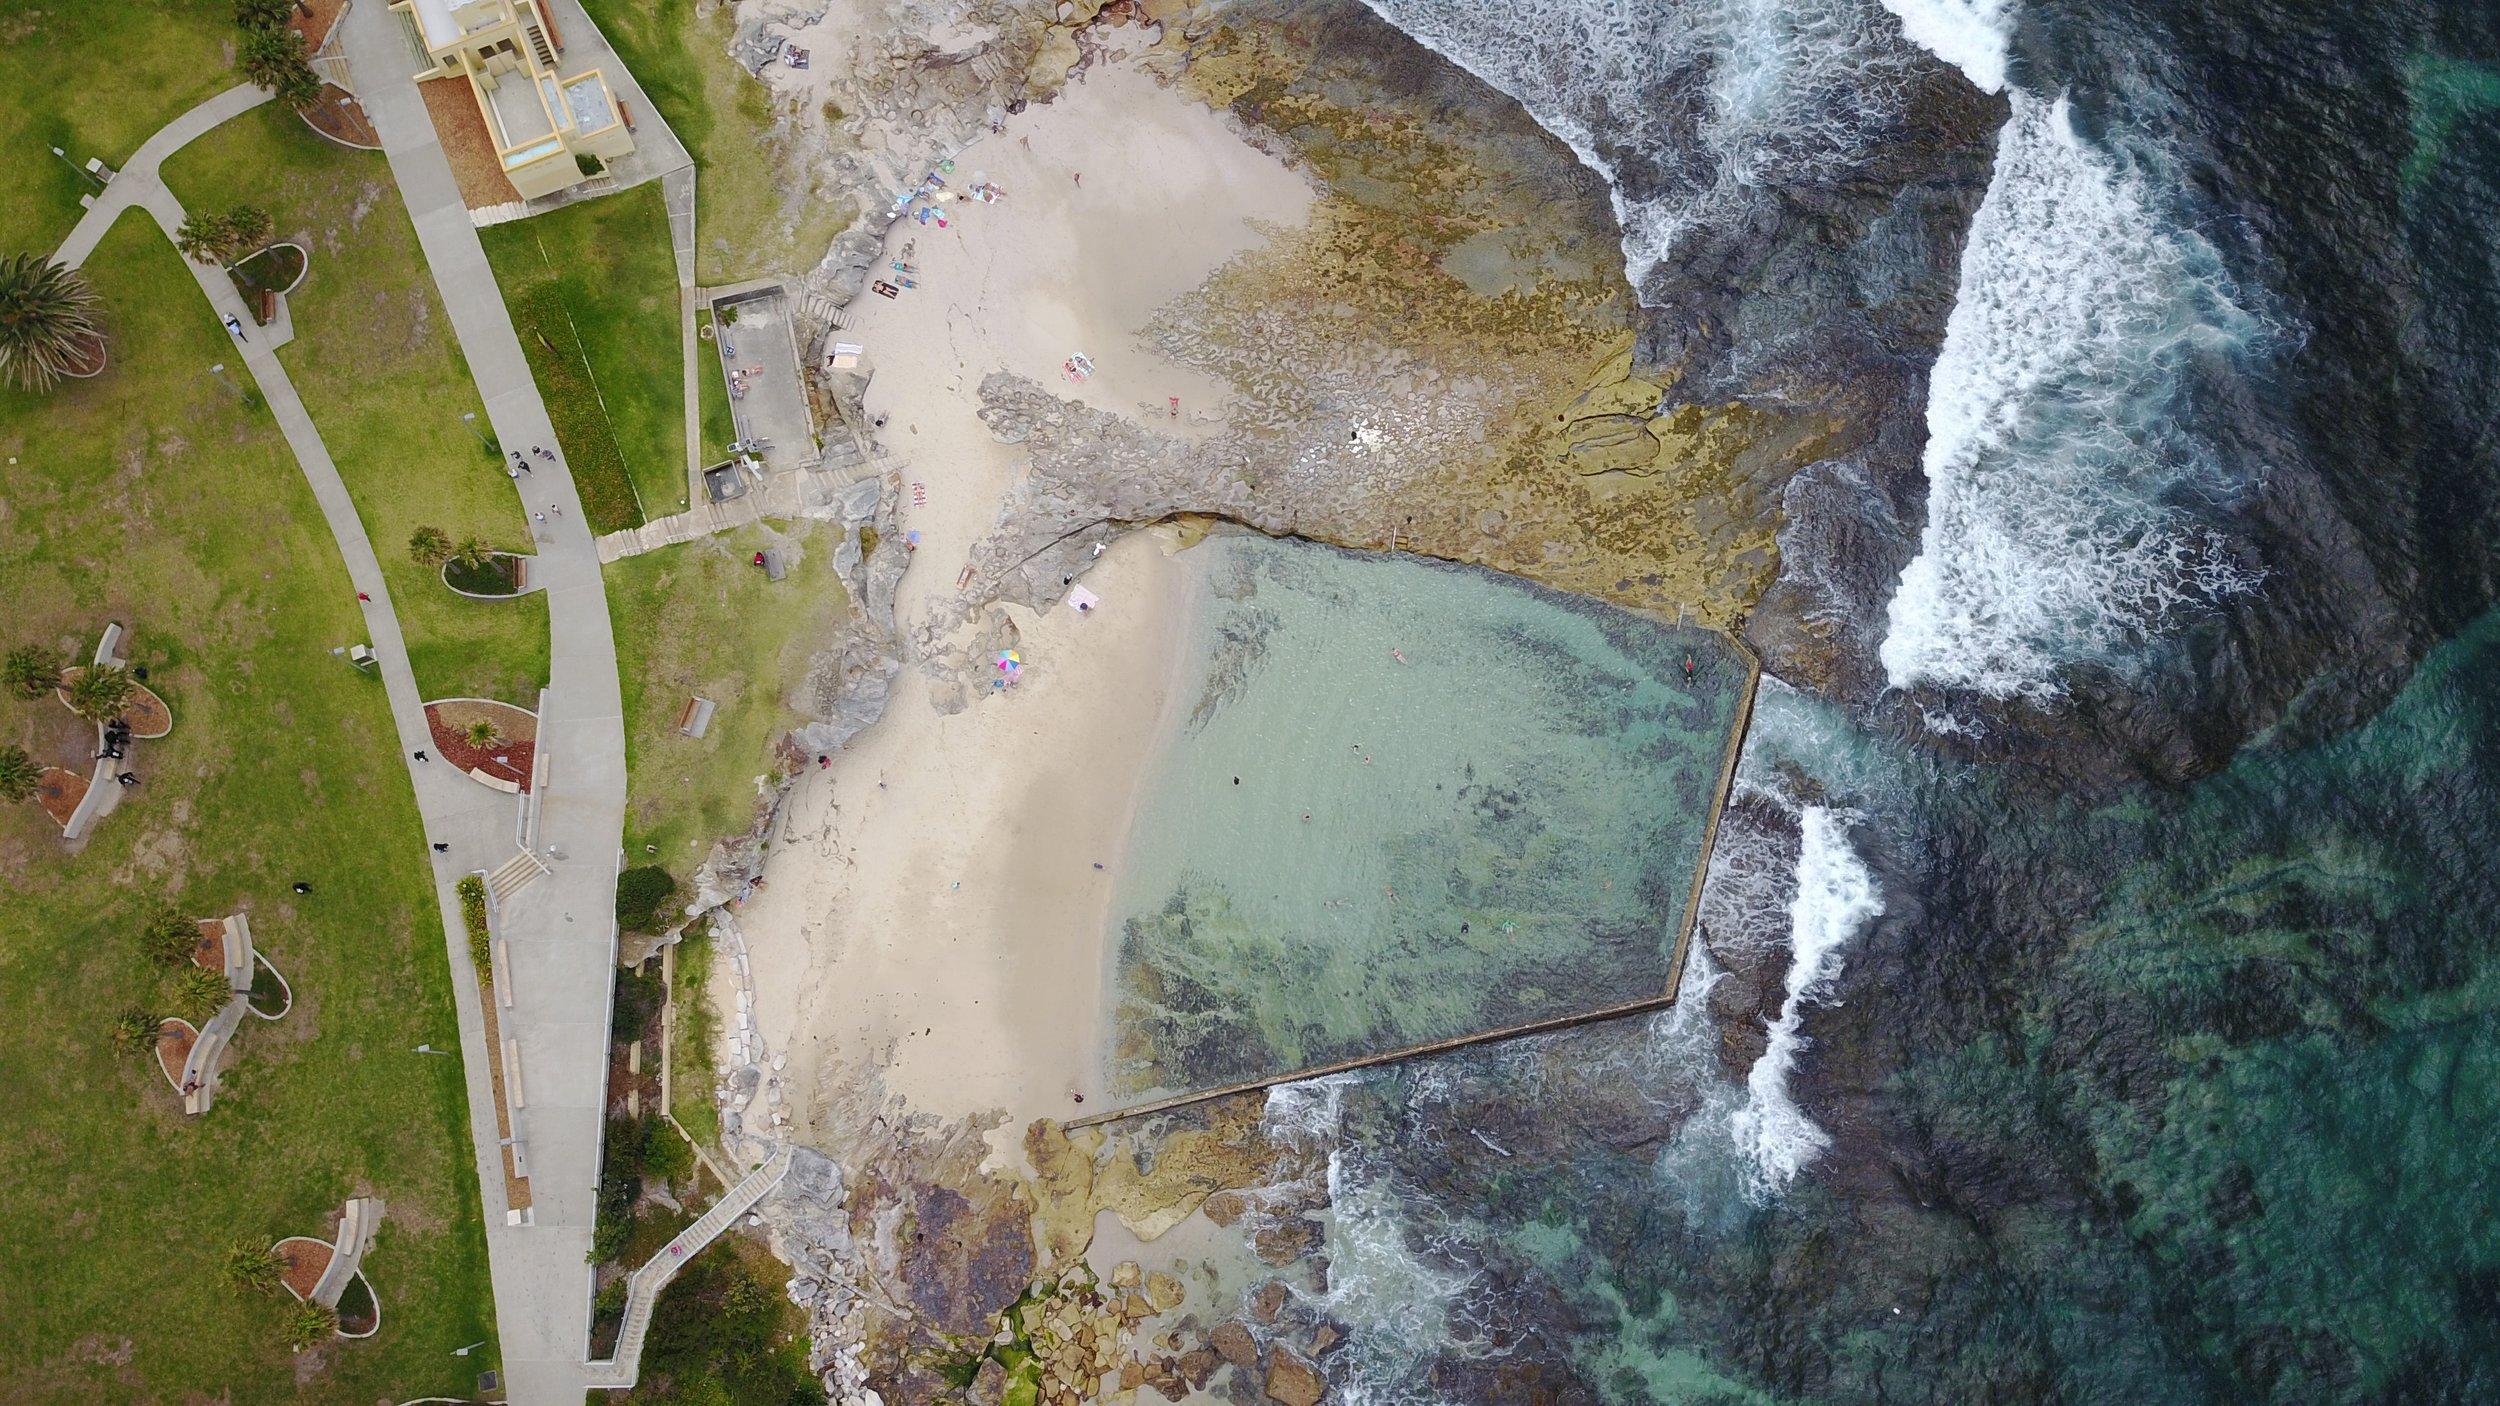 OAK PARK - OAK PARK ocean pool, nsw